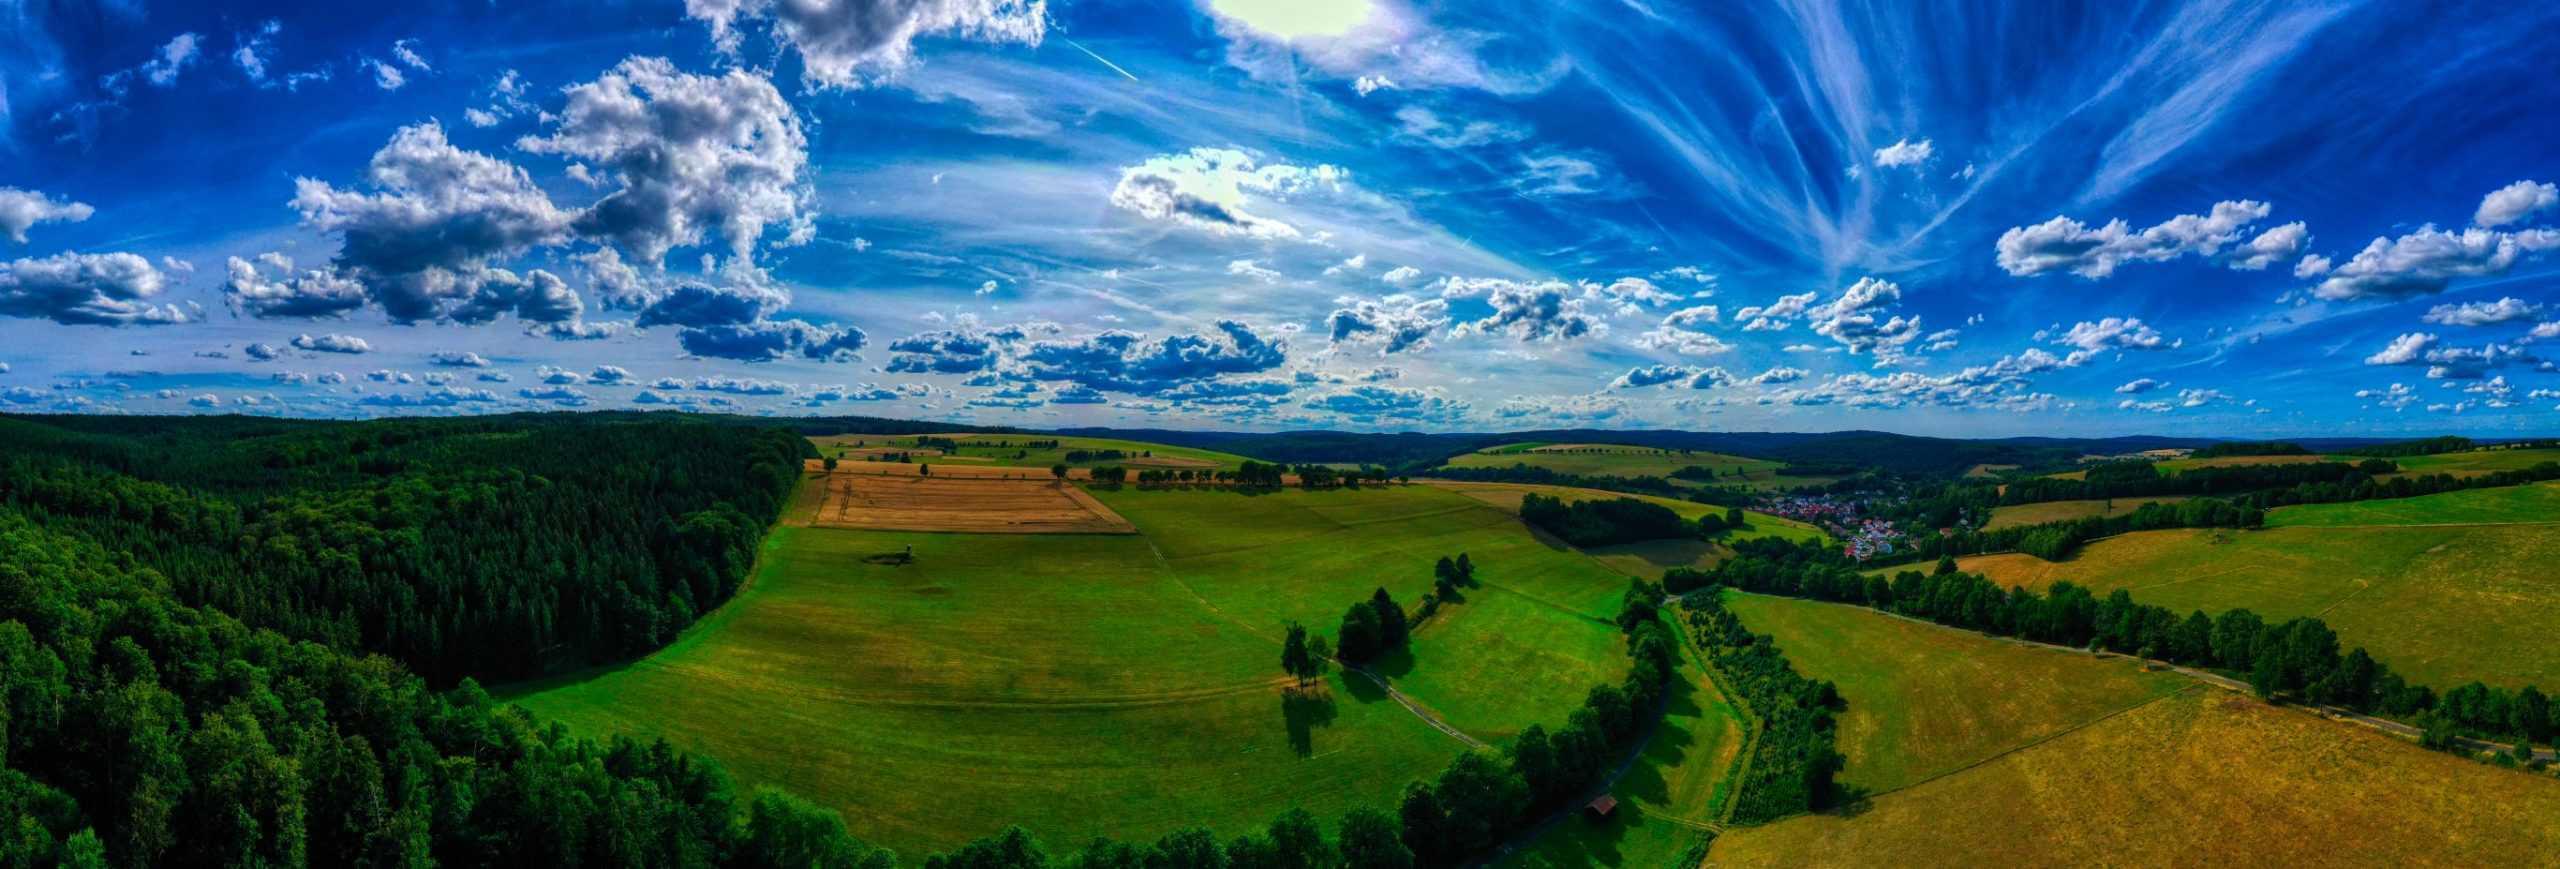 Panorama_Flugbild